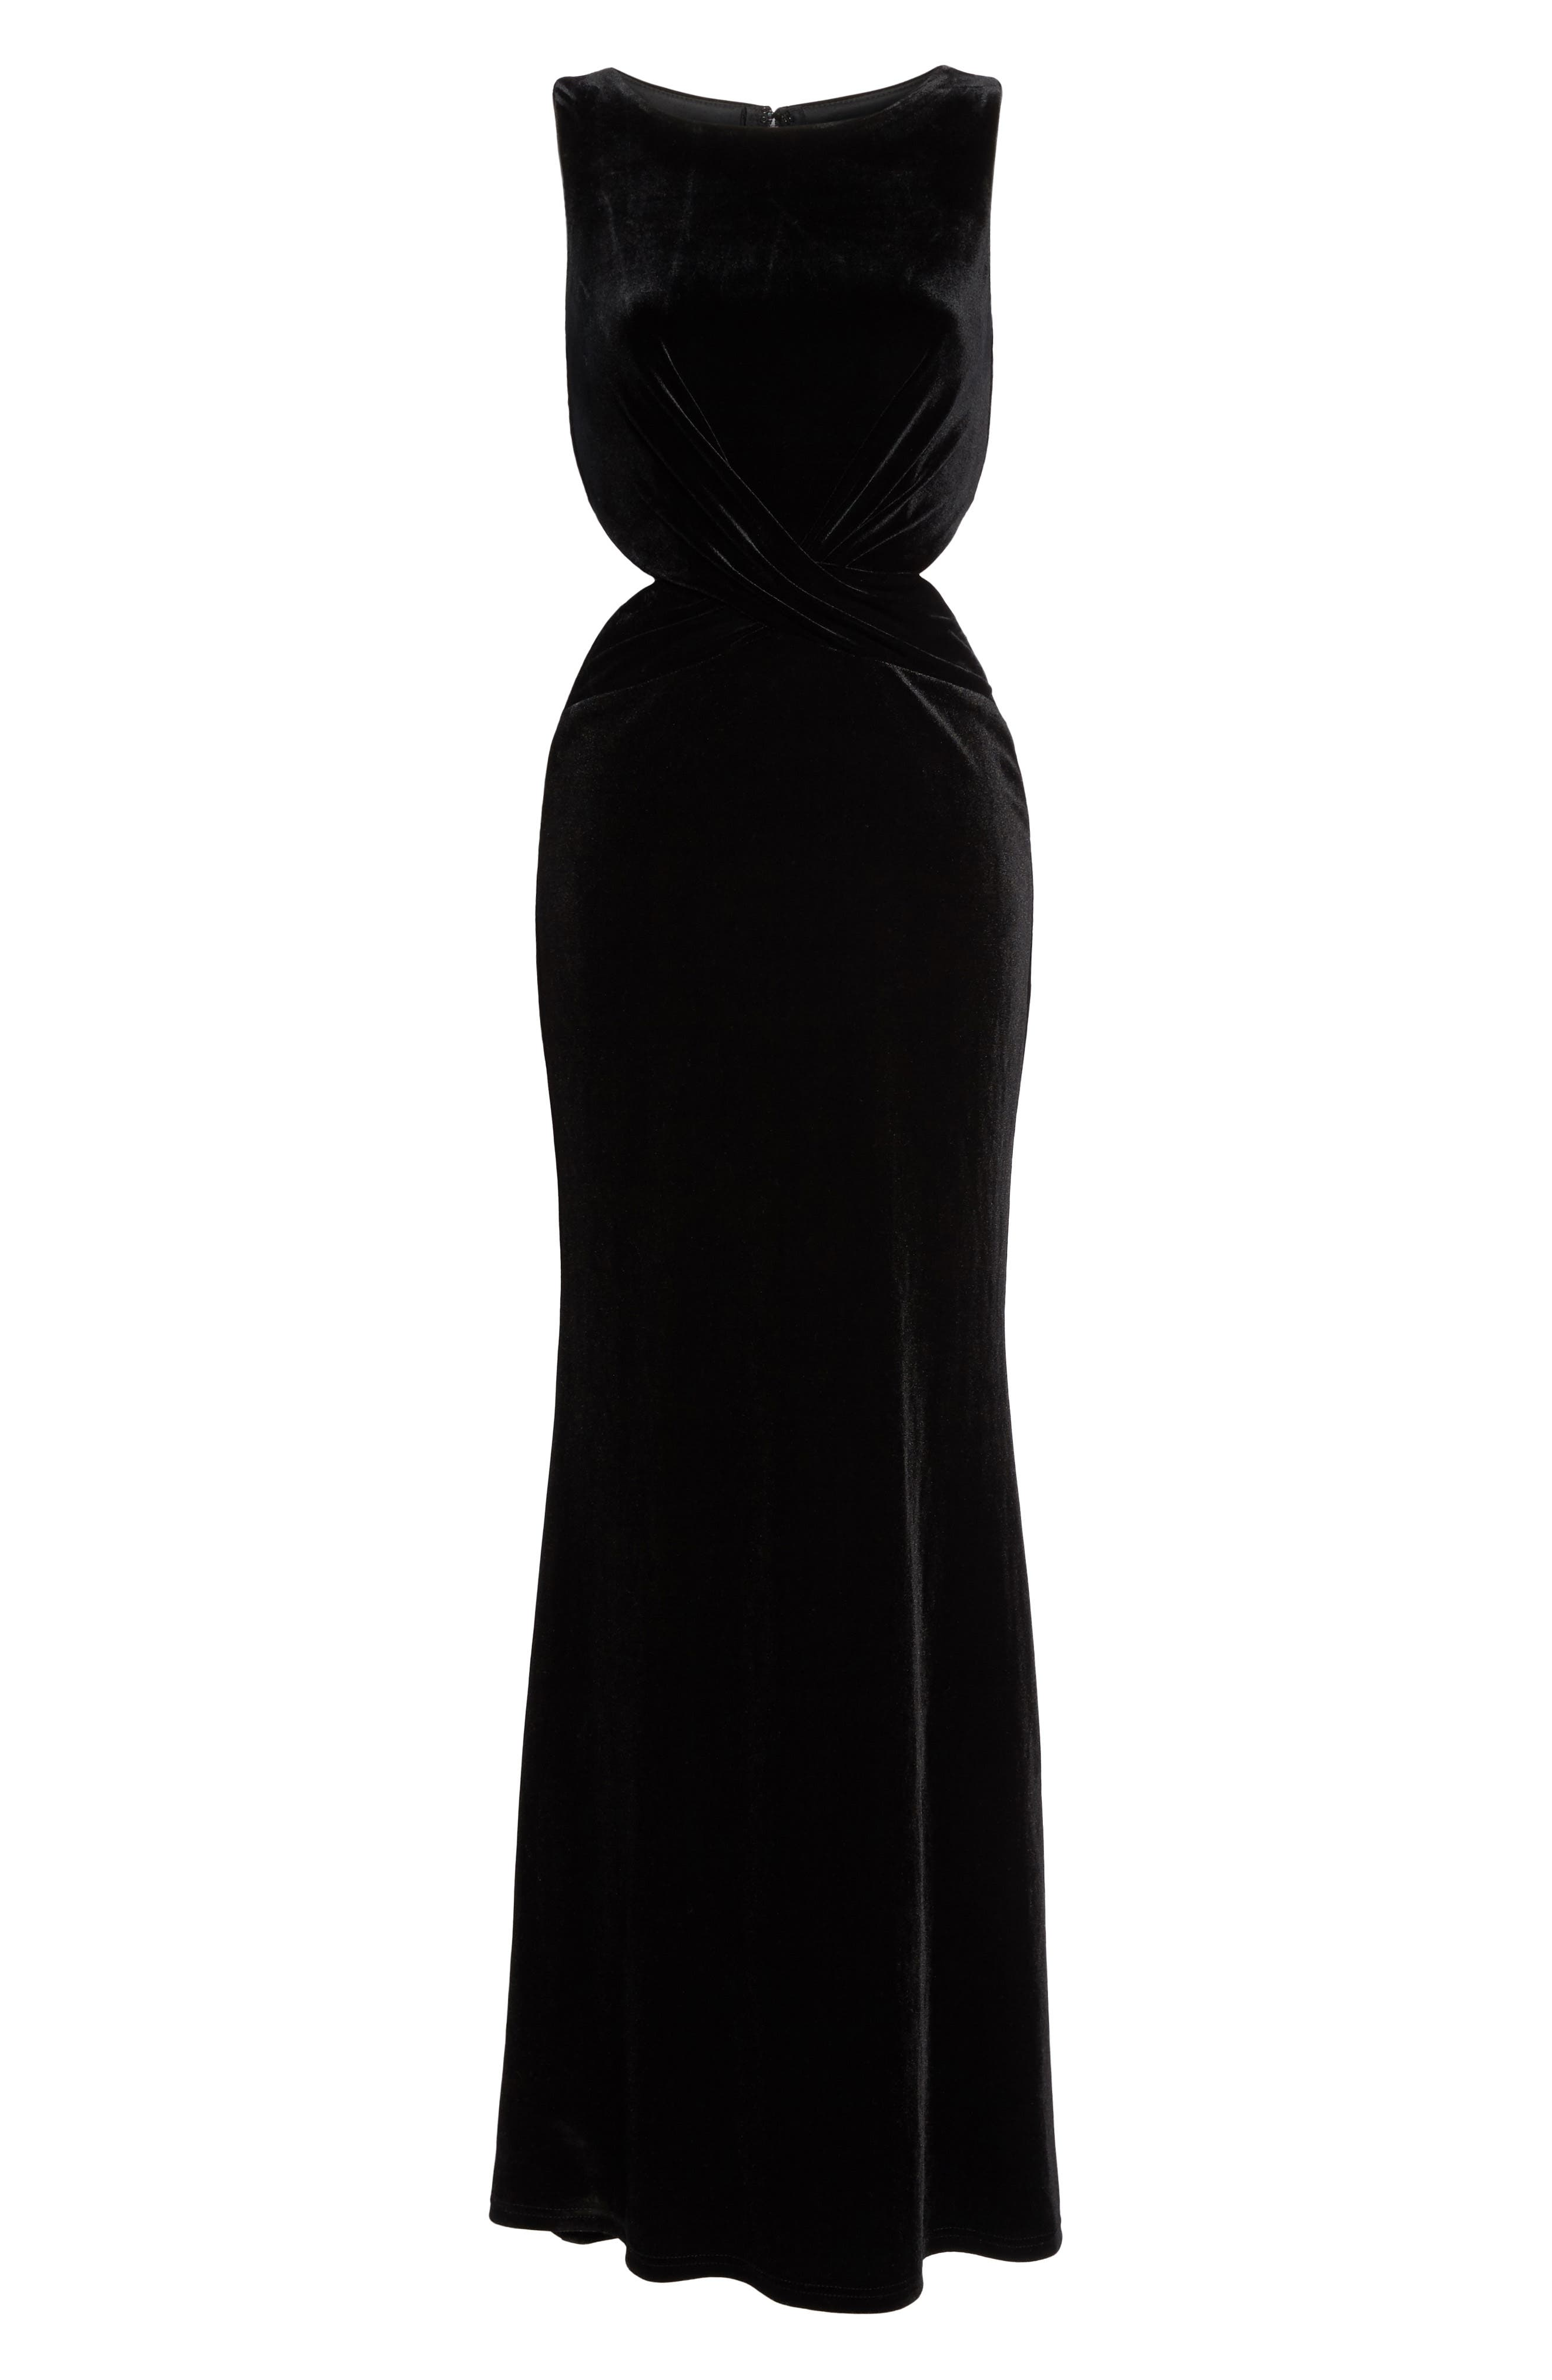 Reach Out Velvet Maxi Dress,                             Alternate thumbnail 6, color,                             001